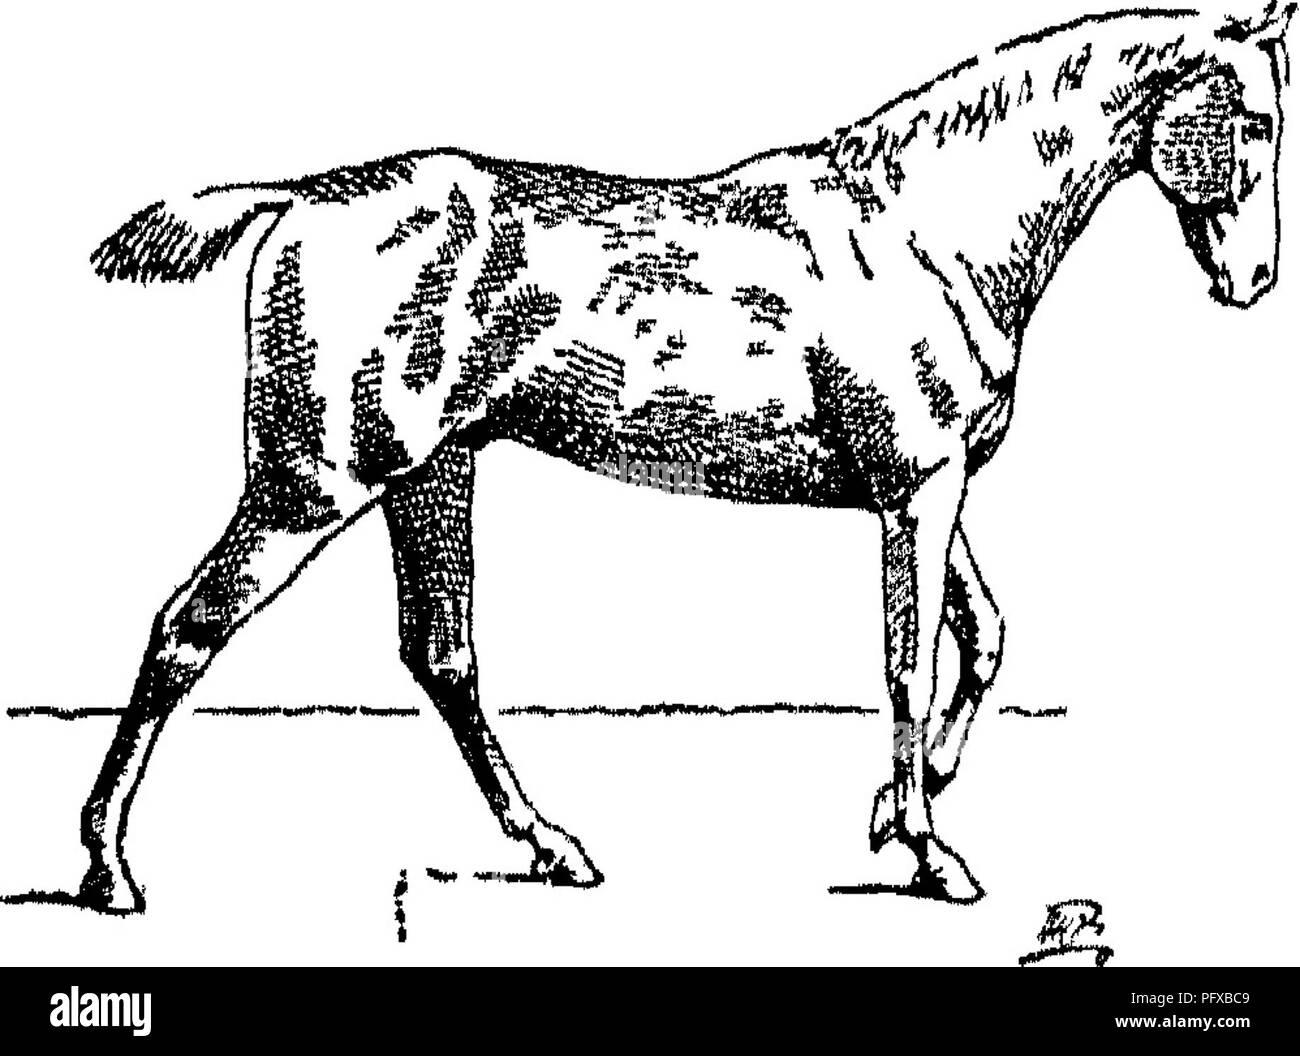 List of pig breeds - Wikipedia